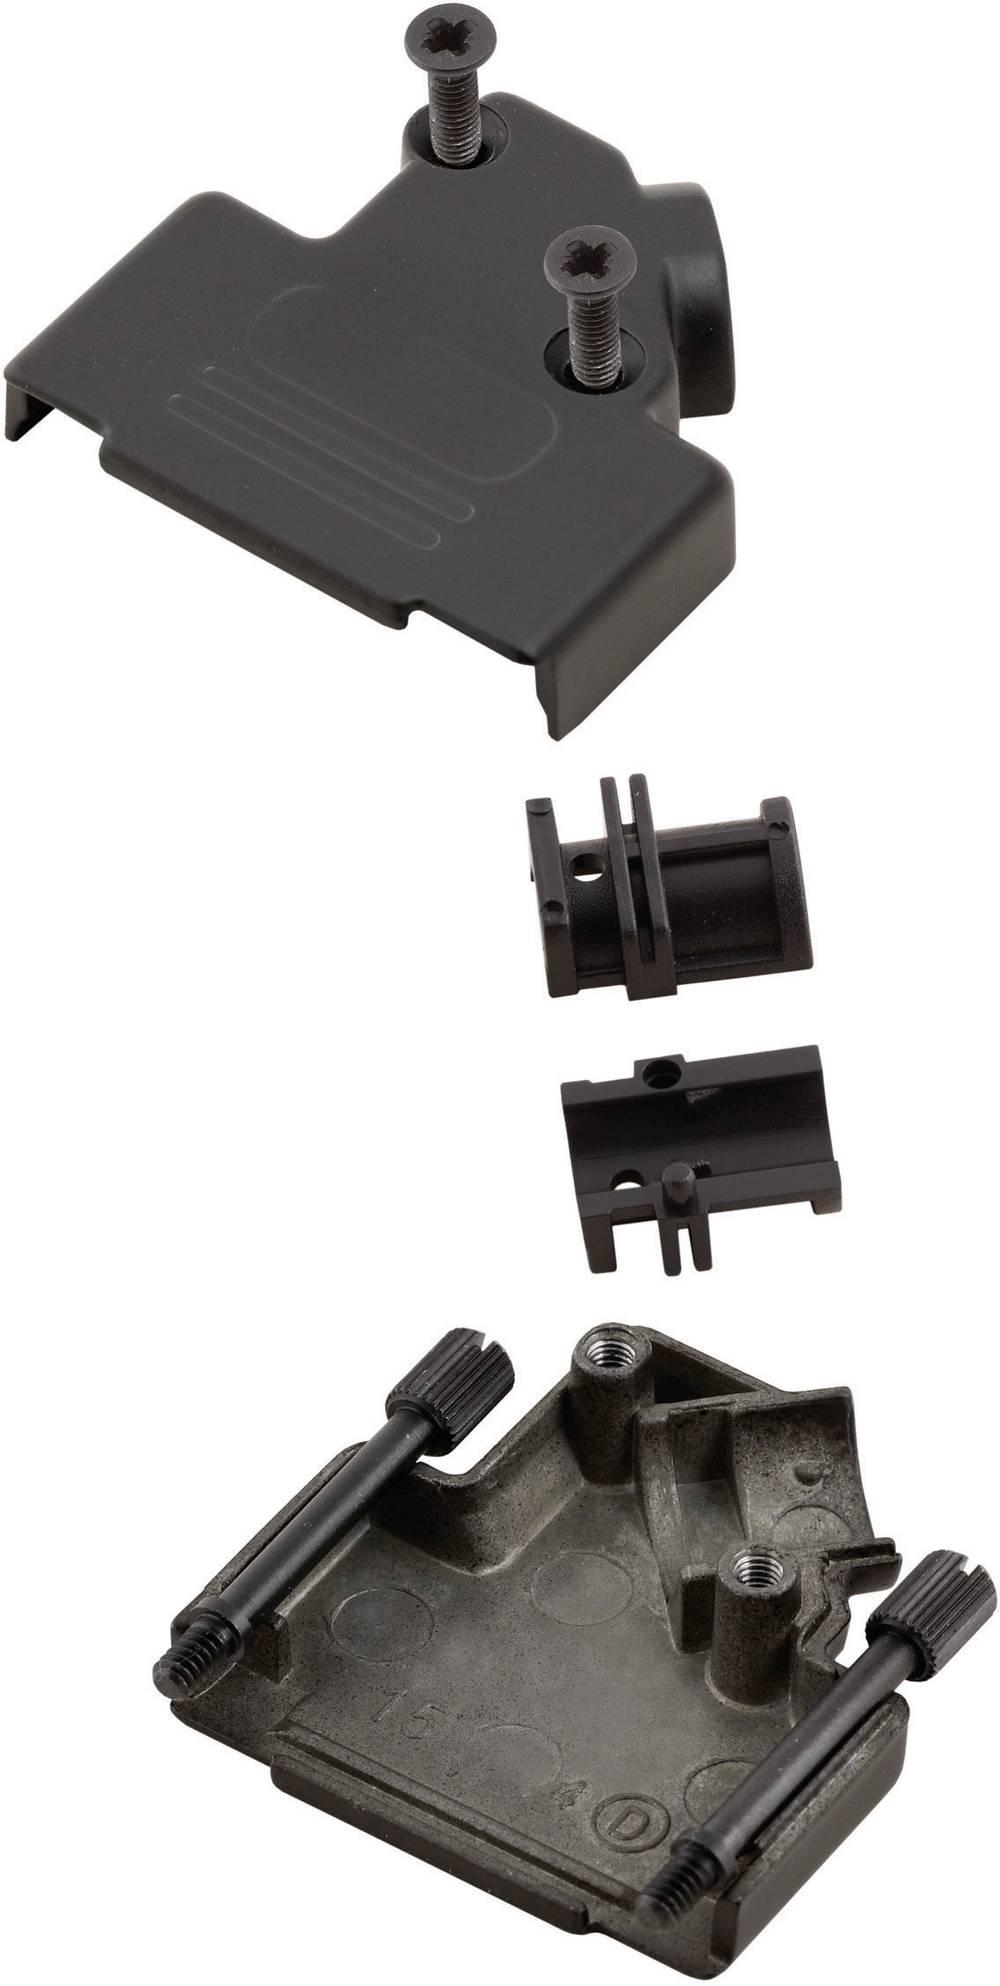 D-SUB Kovinski pokrov, št. polov: 25 MHD45ZK-25-BK-K Encitech 6560-0116-13 MH Connectors